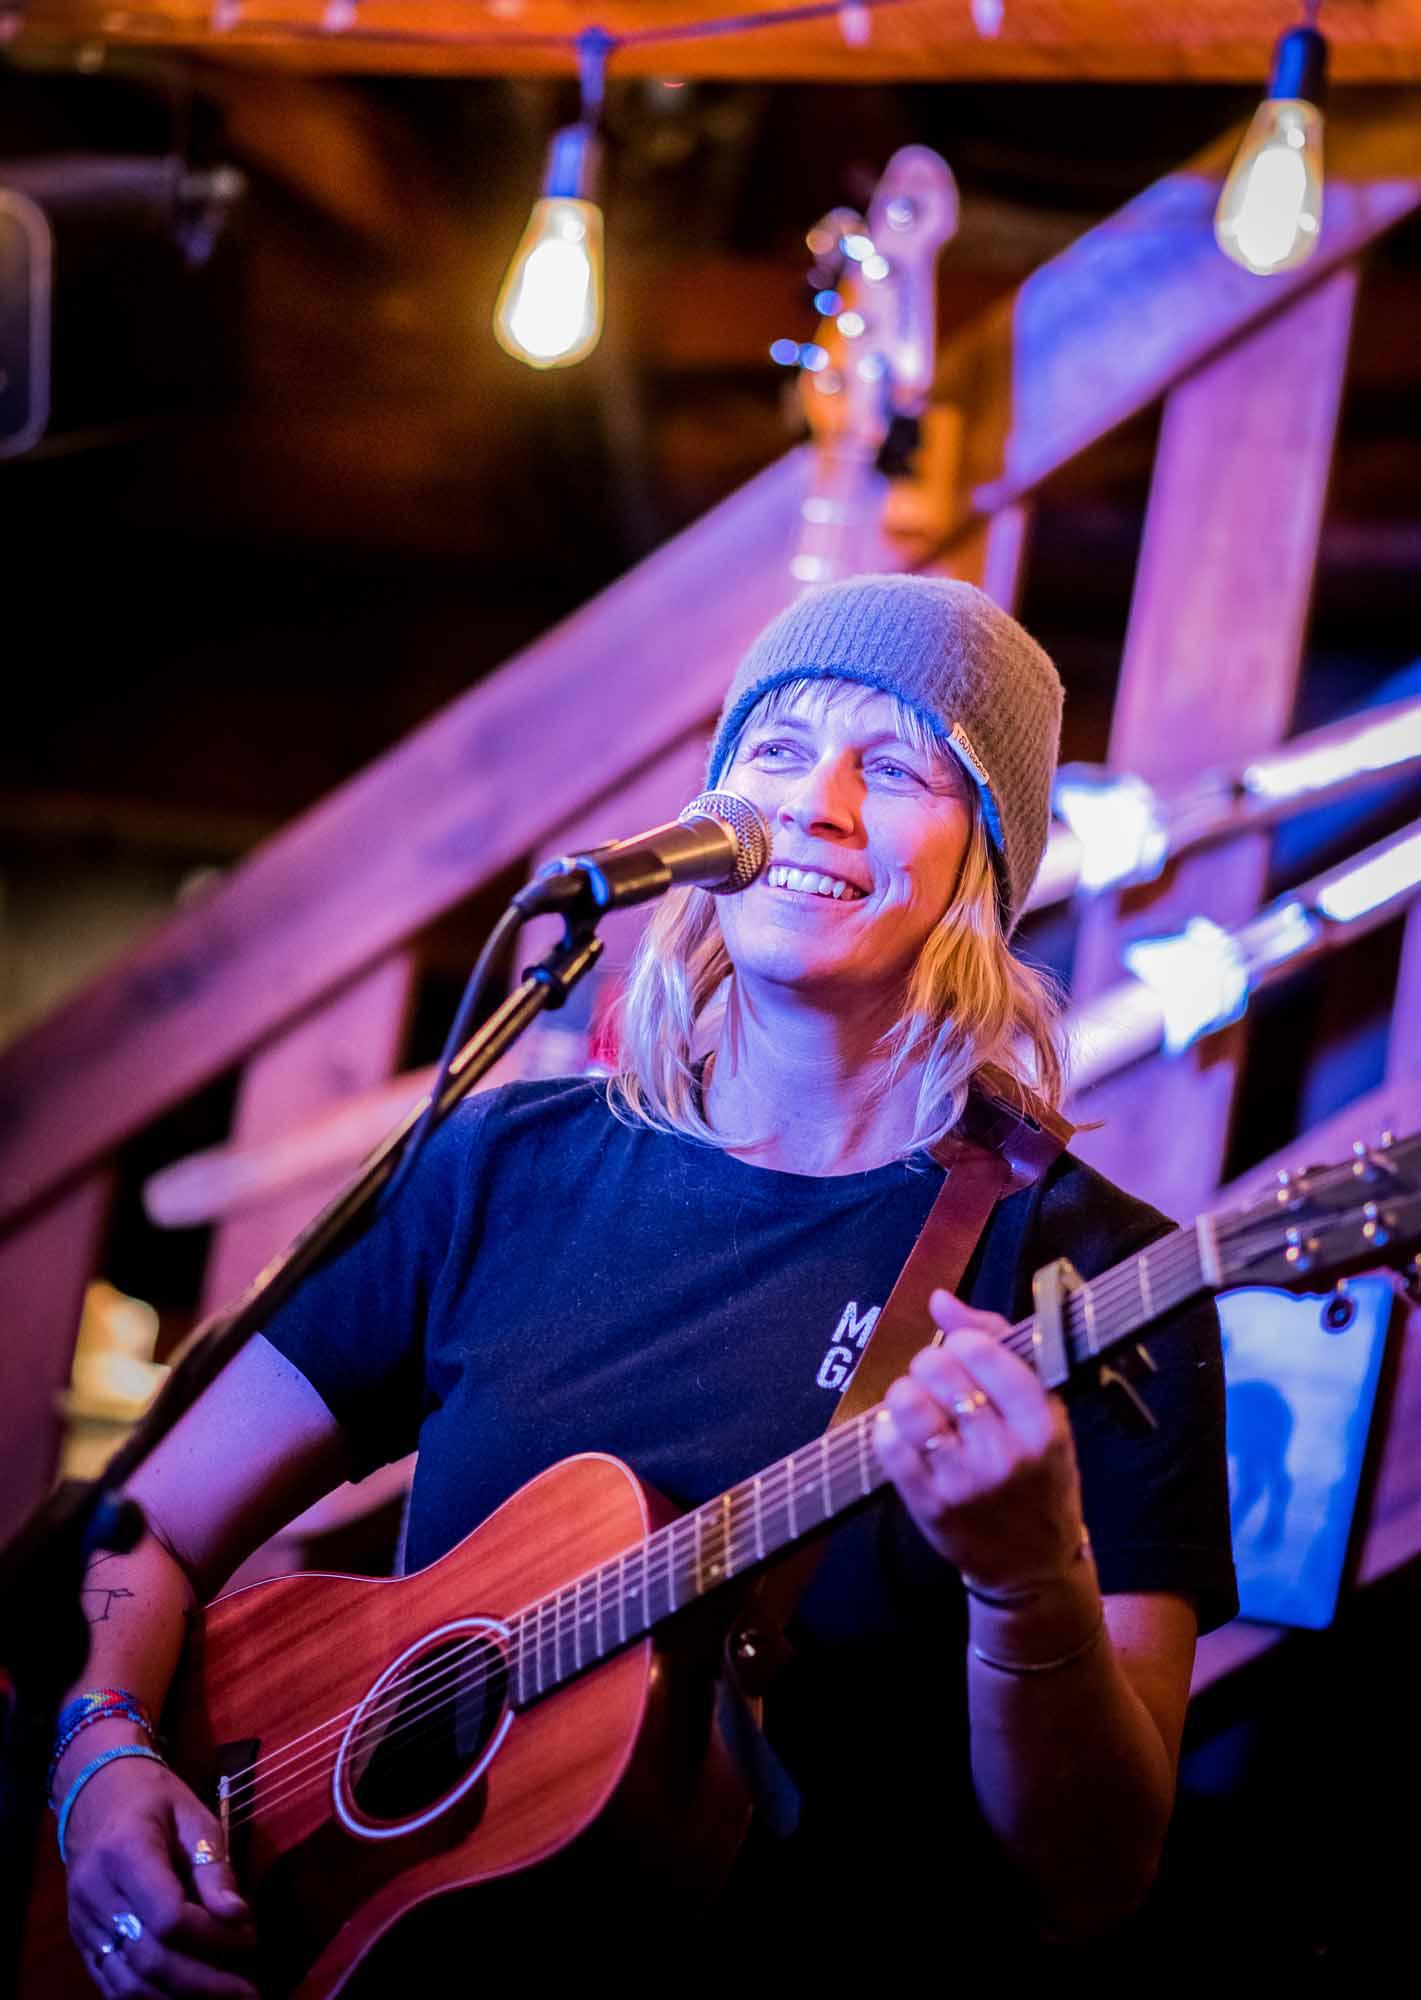 Into-the-Great-White-Open-Moms-Shred-Golden-BC-Kristin-Schnelten-Jam-Night-Guitar